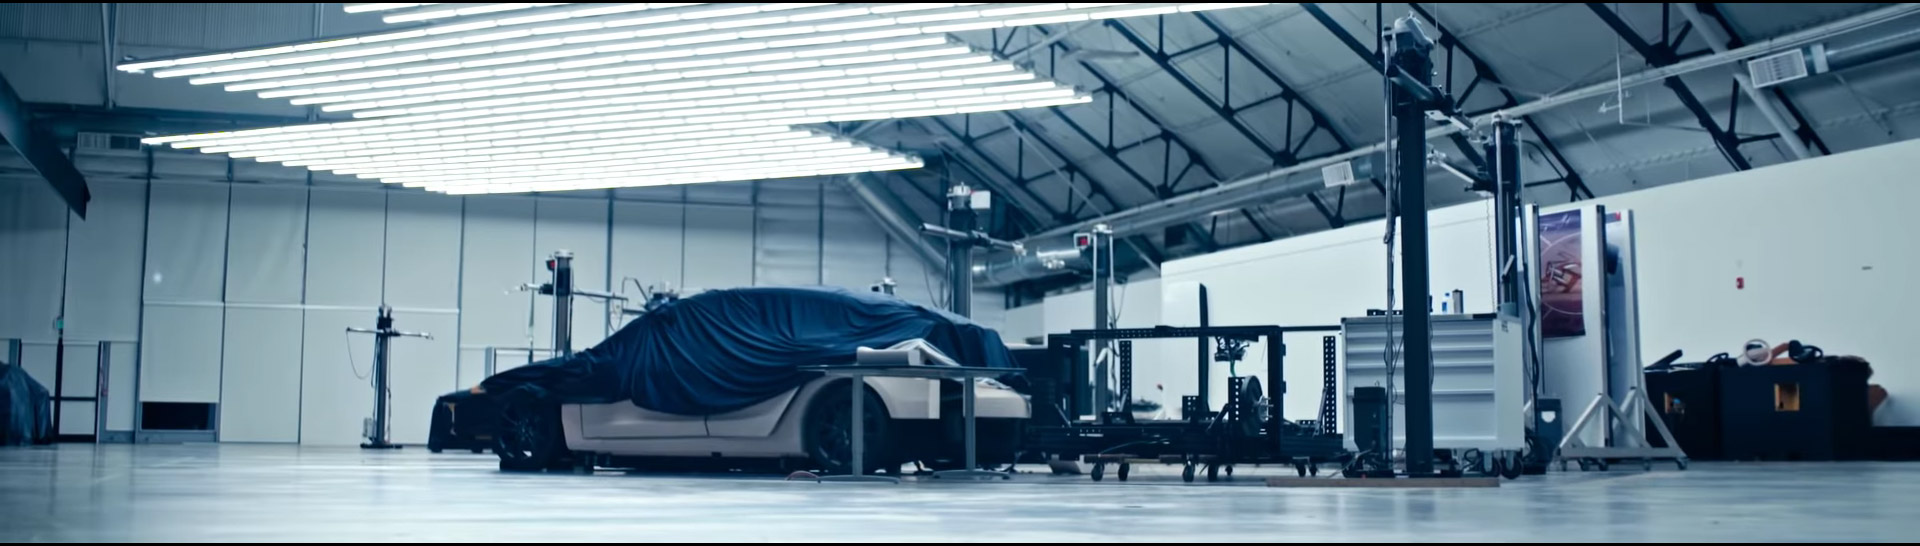 Half covered vehicle in Tesla 2018 video, probably Model Y